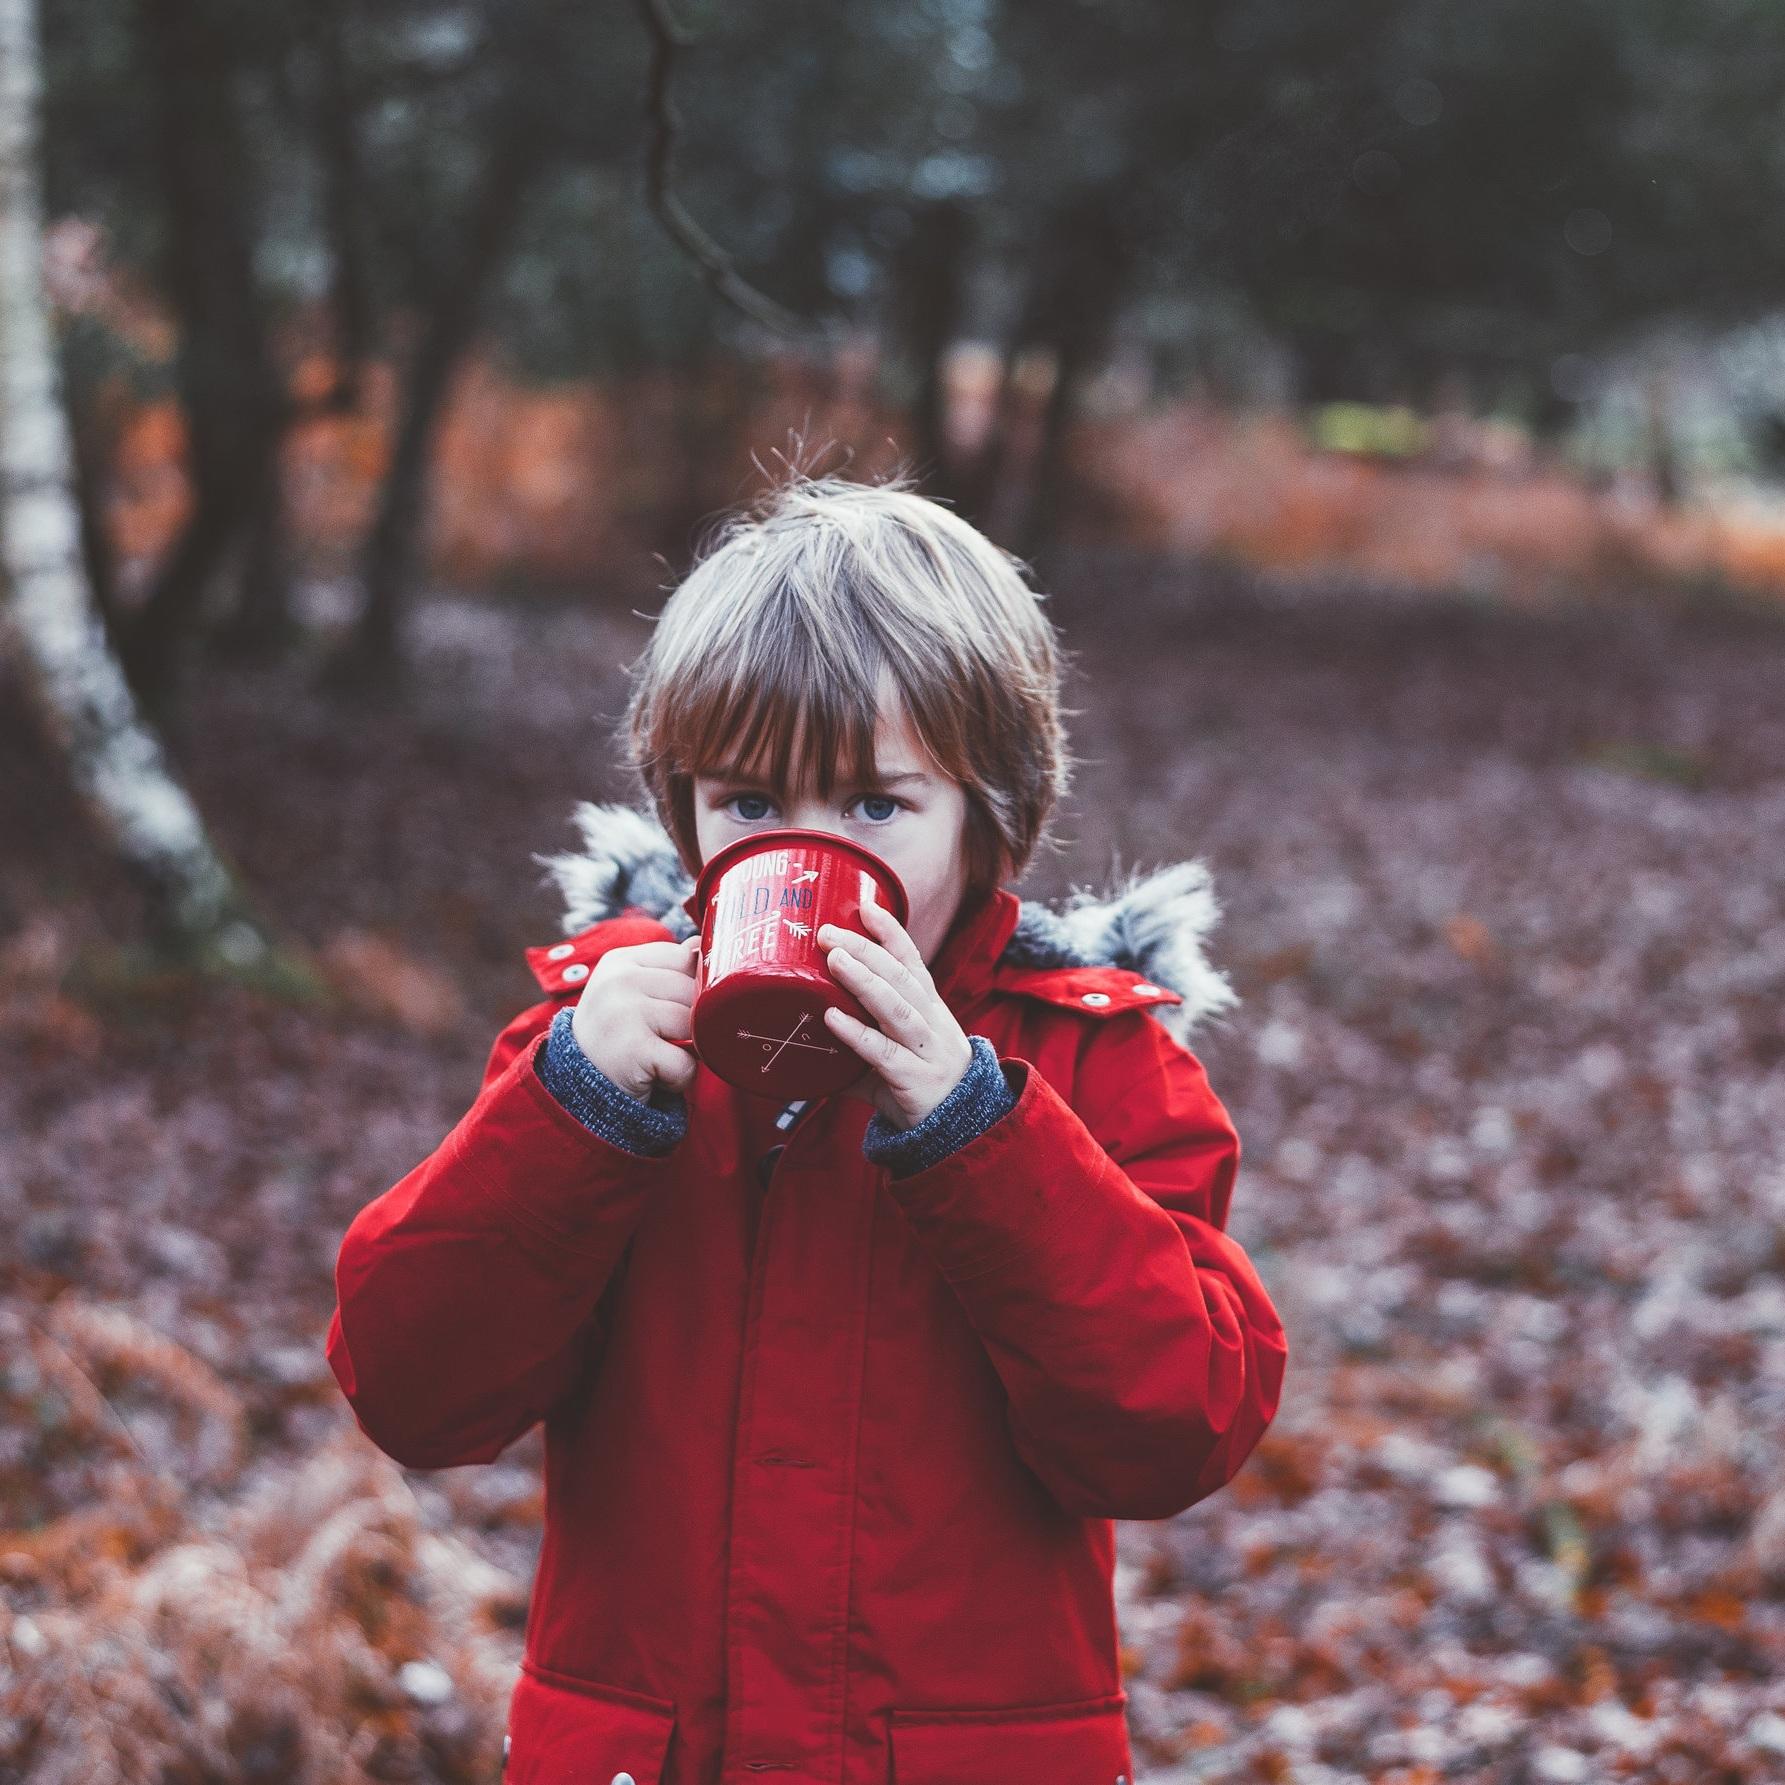 4 Servings of Water - Not Sugary Drinks - - Water, Water Everywhere…Try it!- Sip Smart